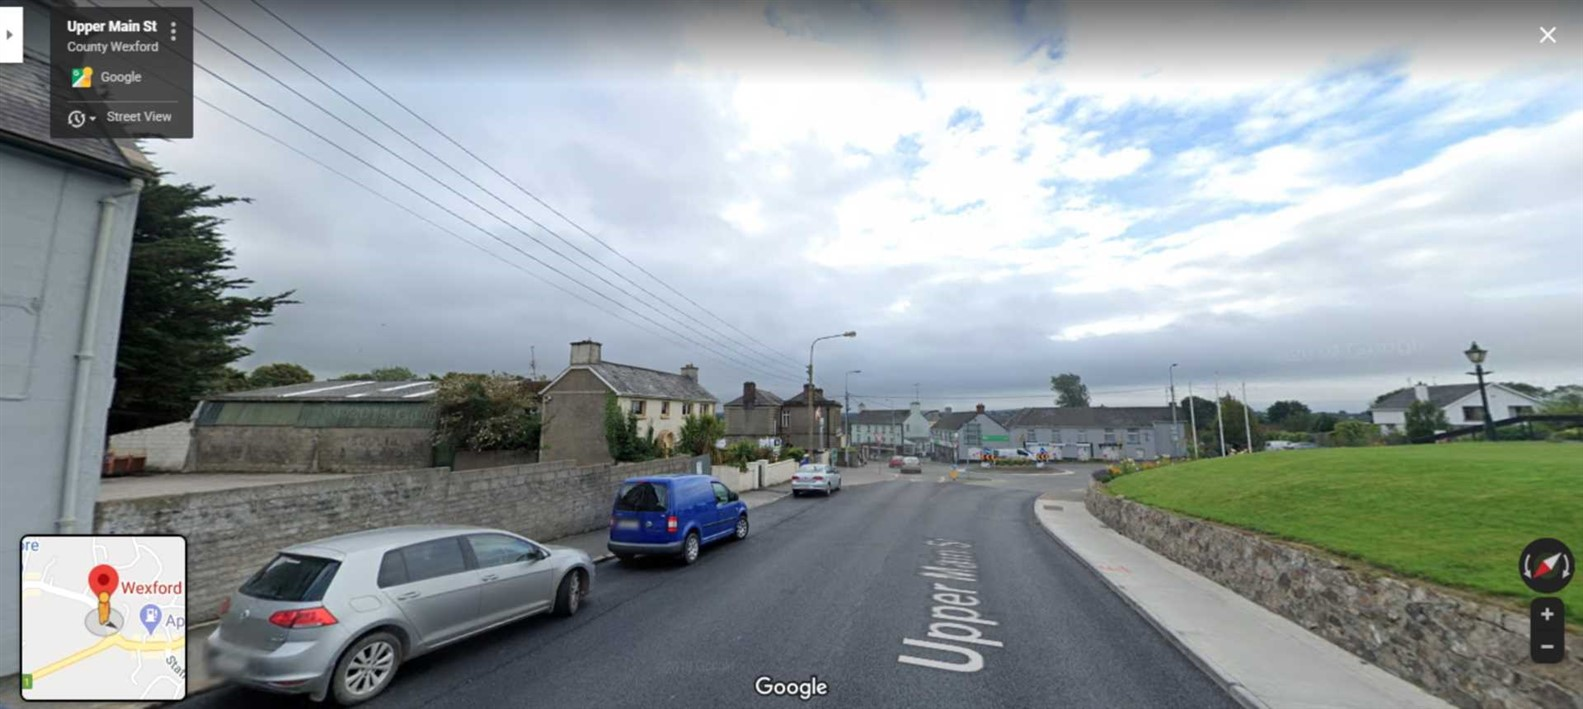 Main Street, Ferns, Wexford